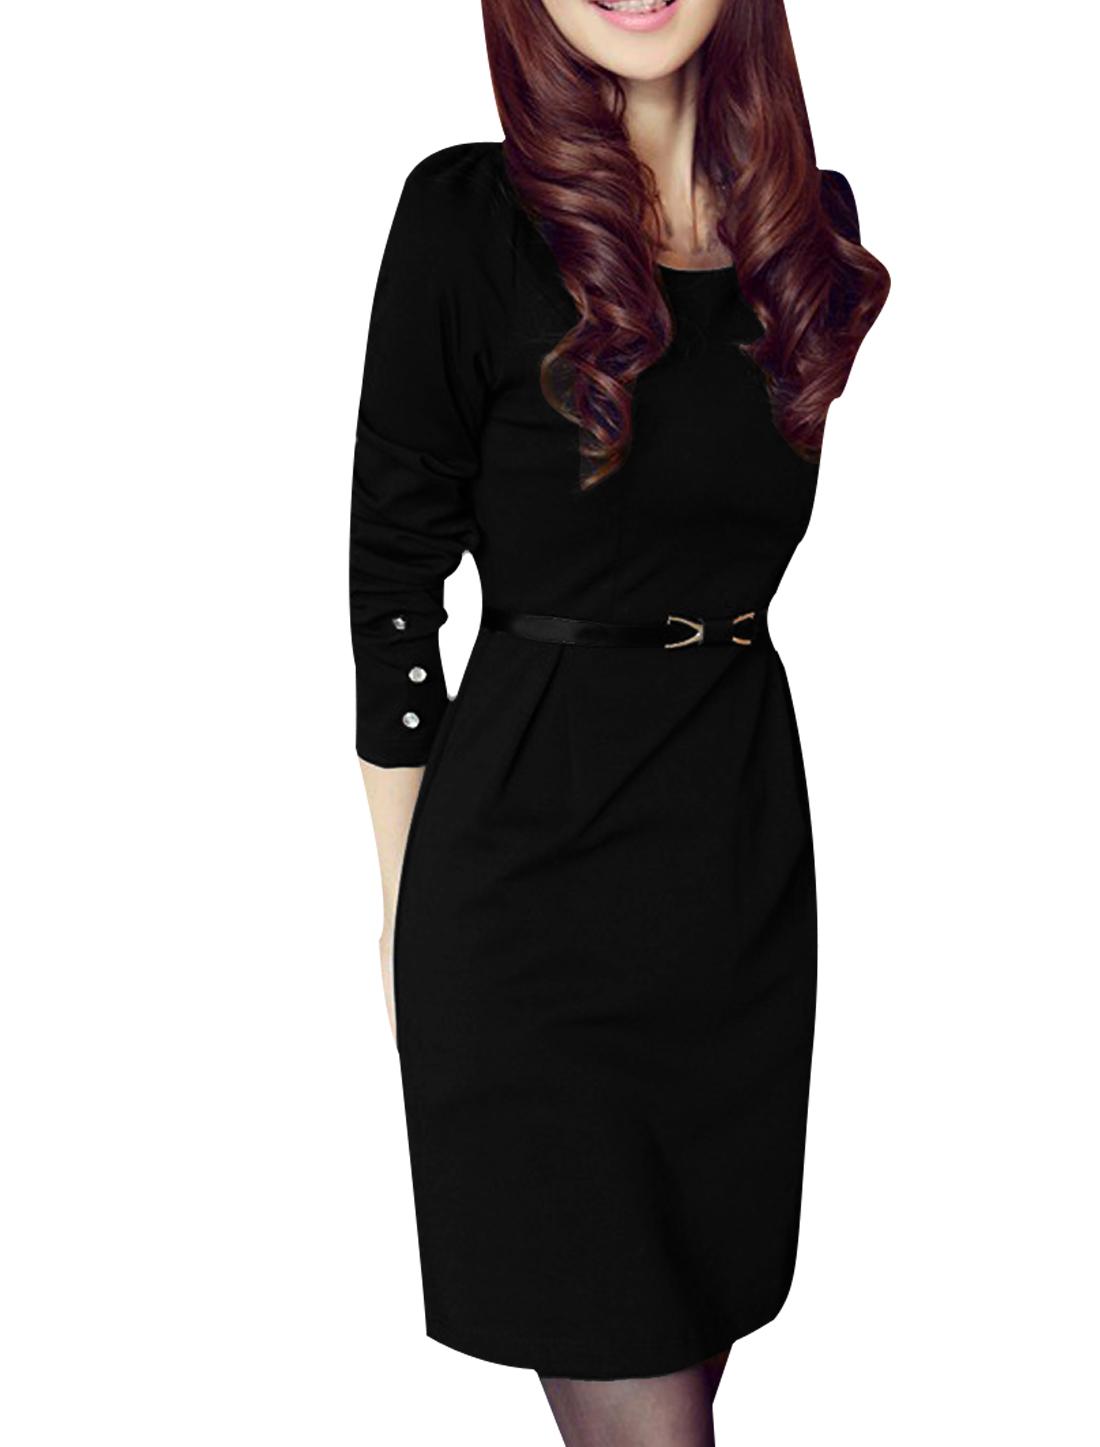 Ladies Long Sleeve Scoop Neck Straight Cutting Black Dress W Belt XS